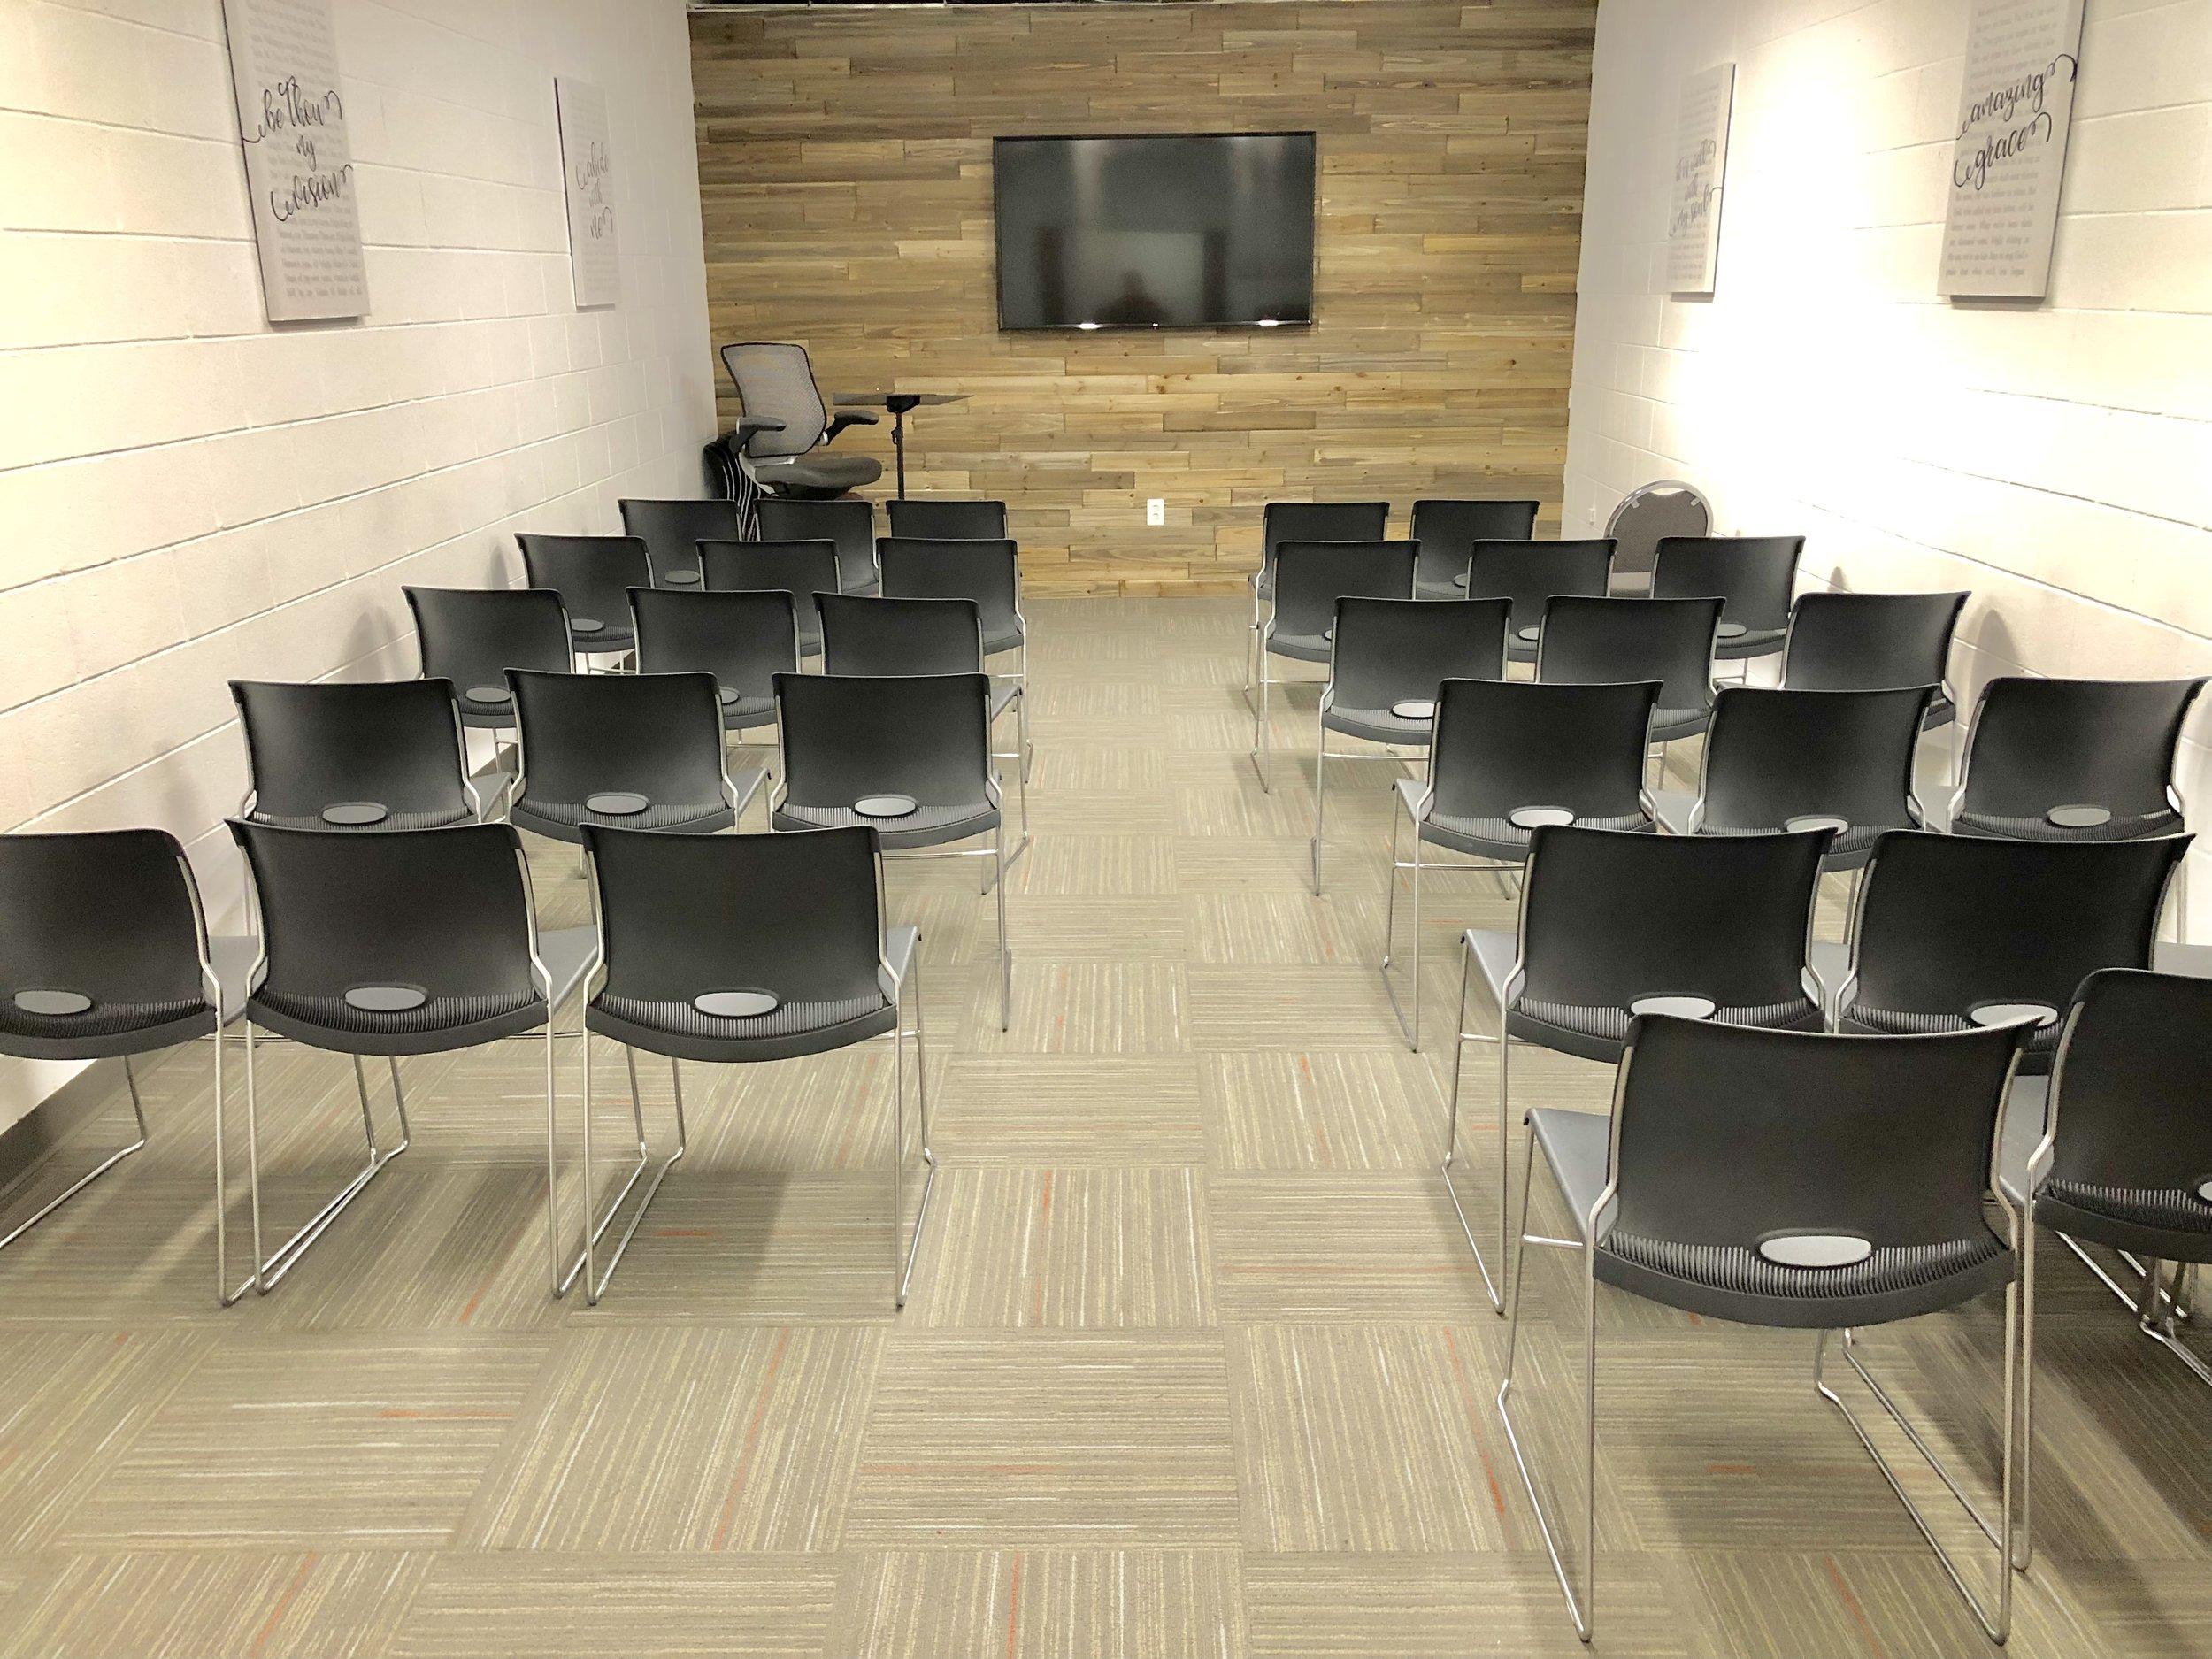 Young Professionals Classroom